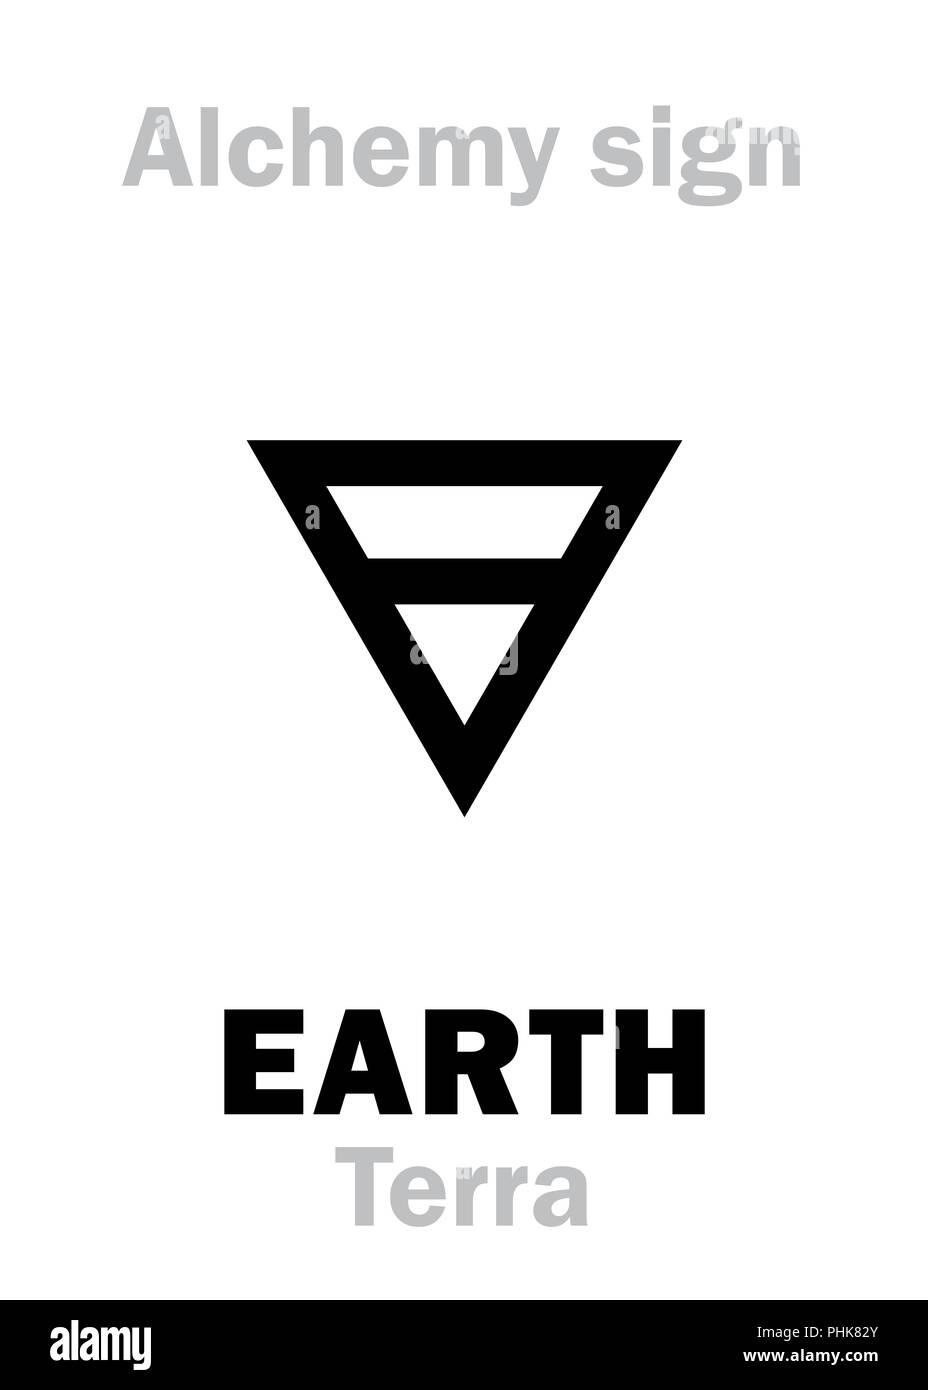 Alchemy: EARTH (Terra) - Stock Image